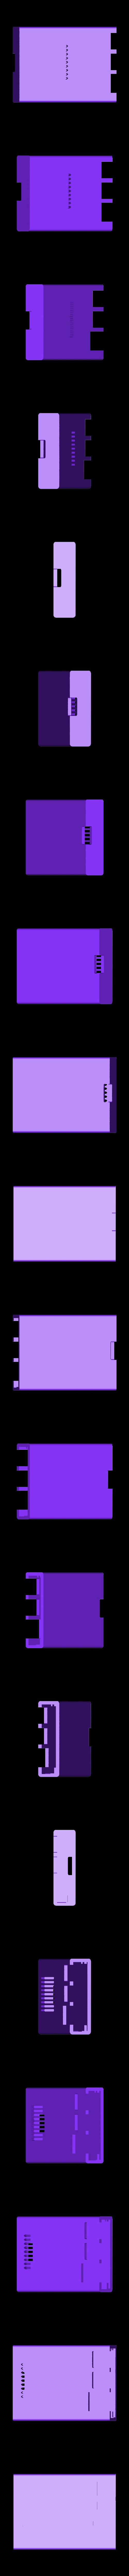 Raspberry_Pi_3B%2B_Sleeve.Sleeve.Body1-openHAB.stl Télécharger fichier STL gratuit Raspberry Pi 3B+ Sleeve • Design à imprimer en 3D, Wilko